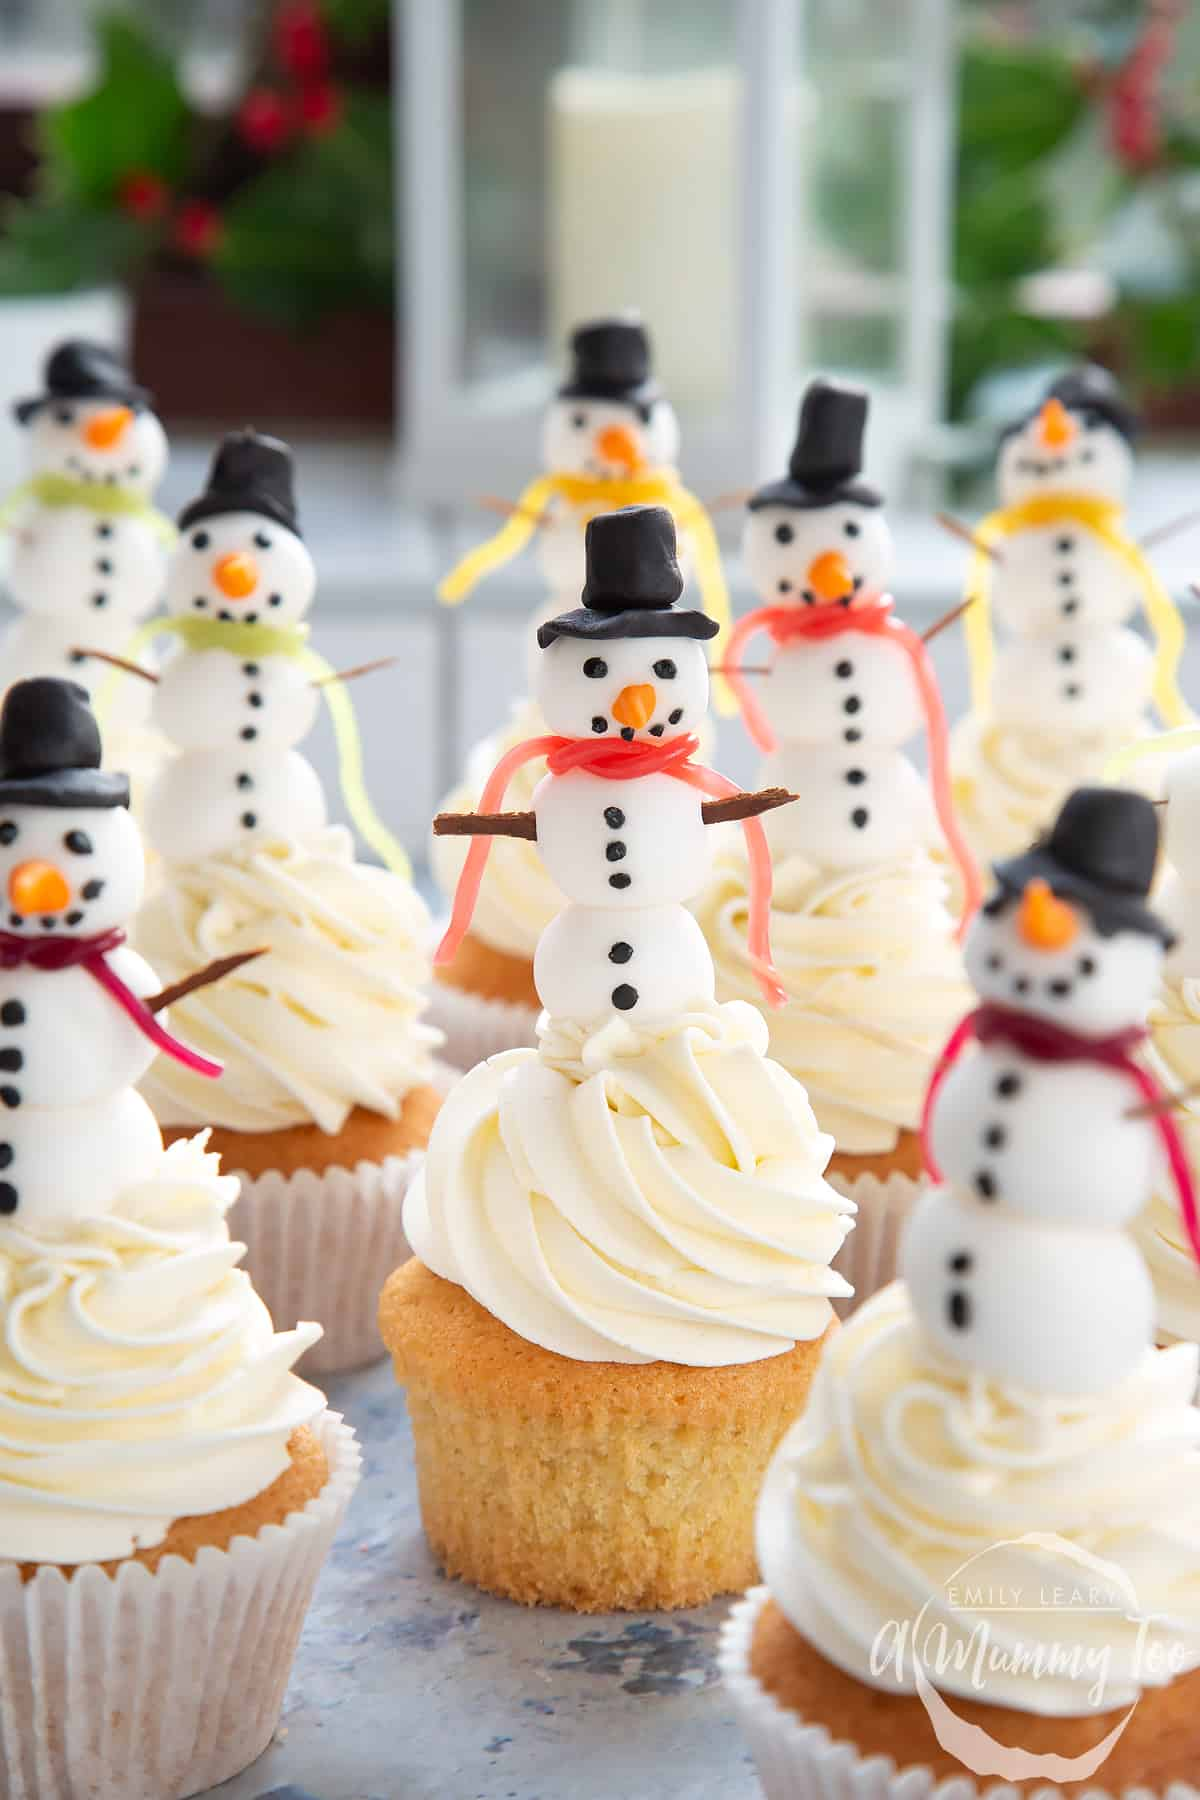 Multiple snowman cupcakes.